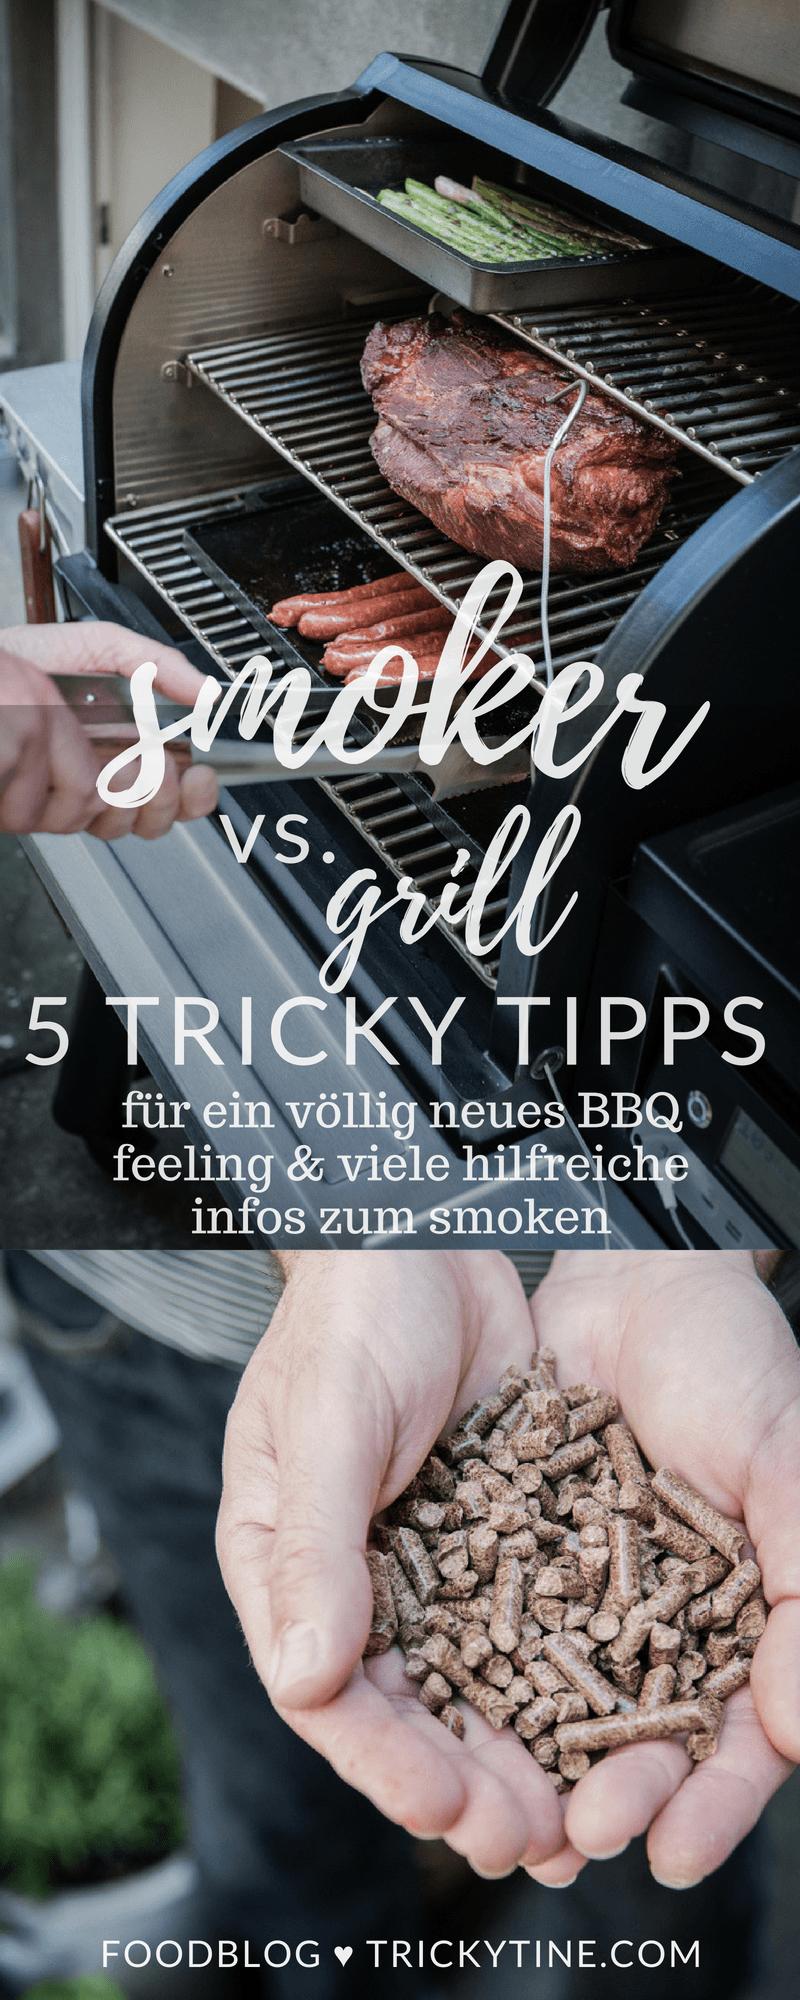 smoker trickytine tipps timberland 850 traeger grills